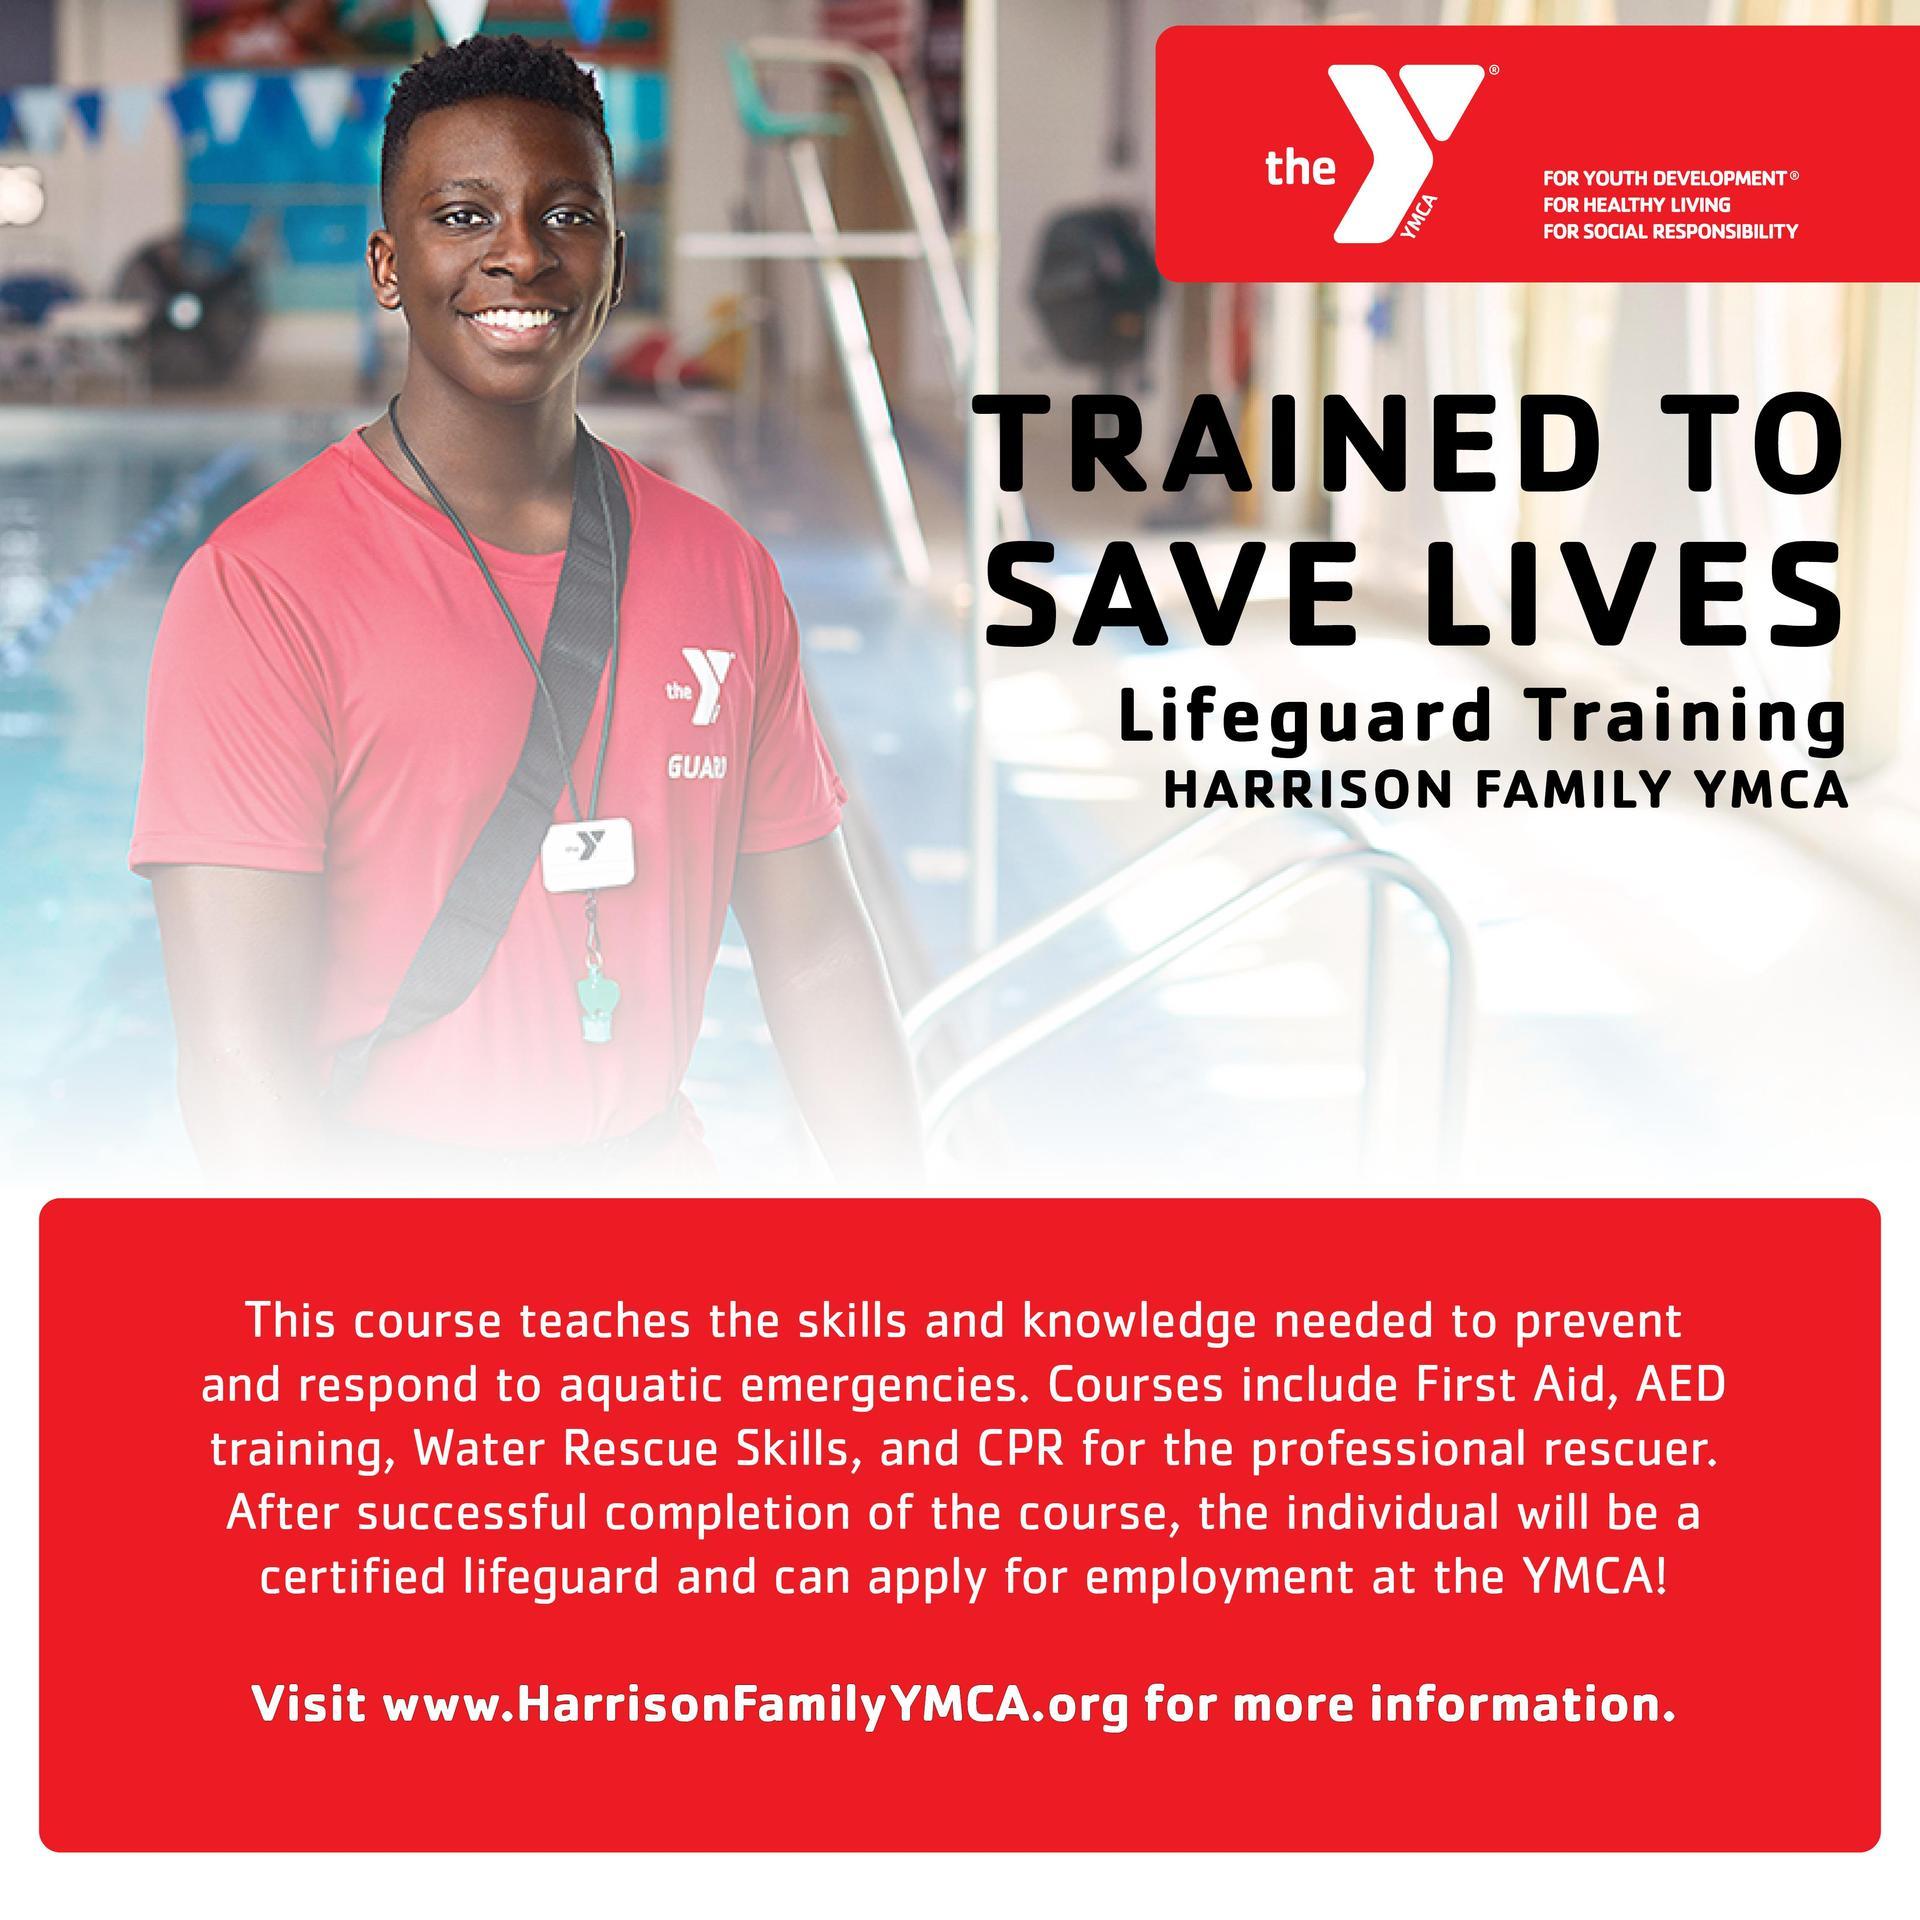 YMCA Lifeguard Training